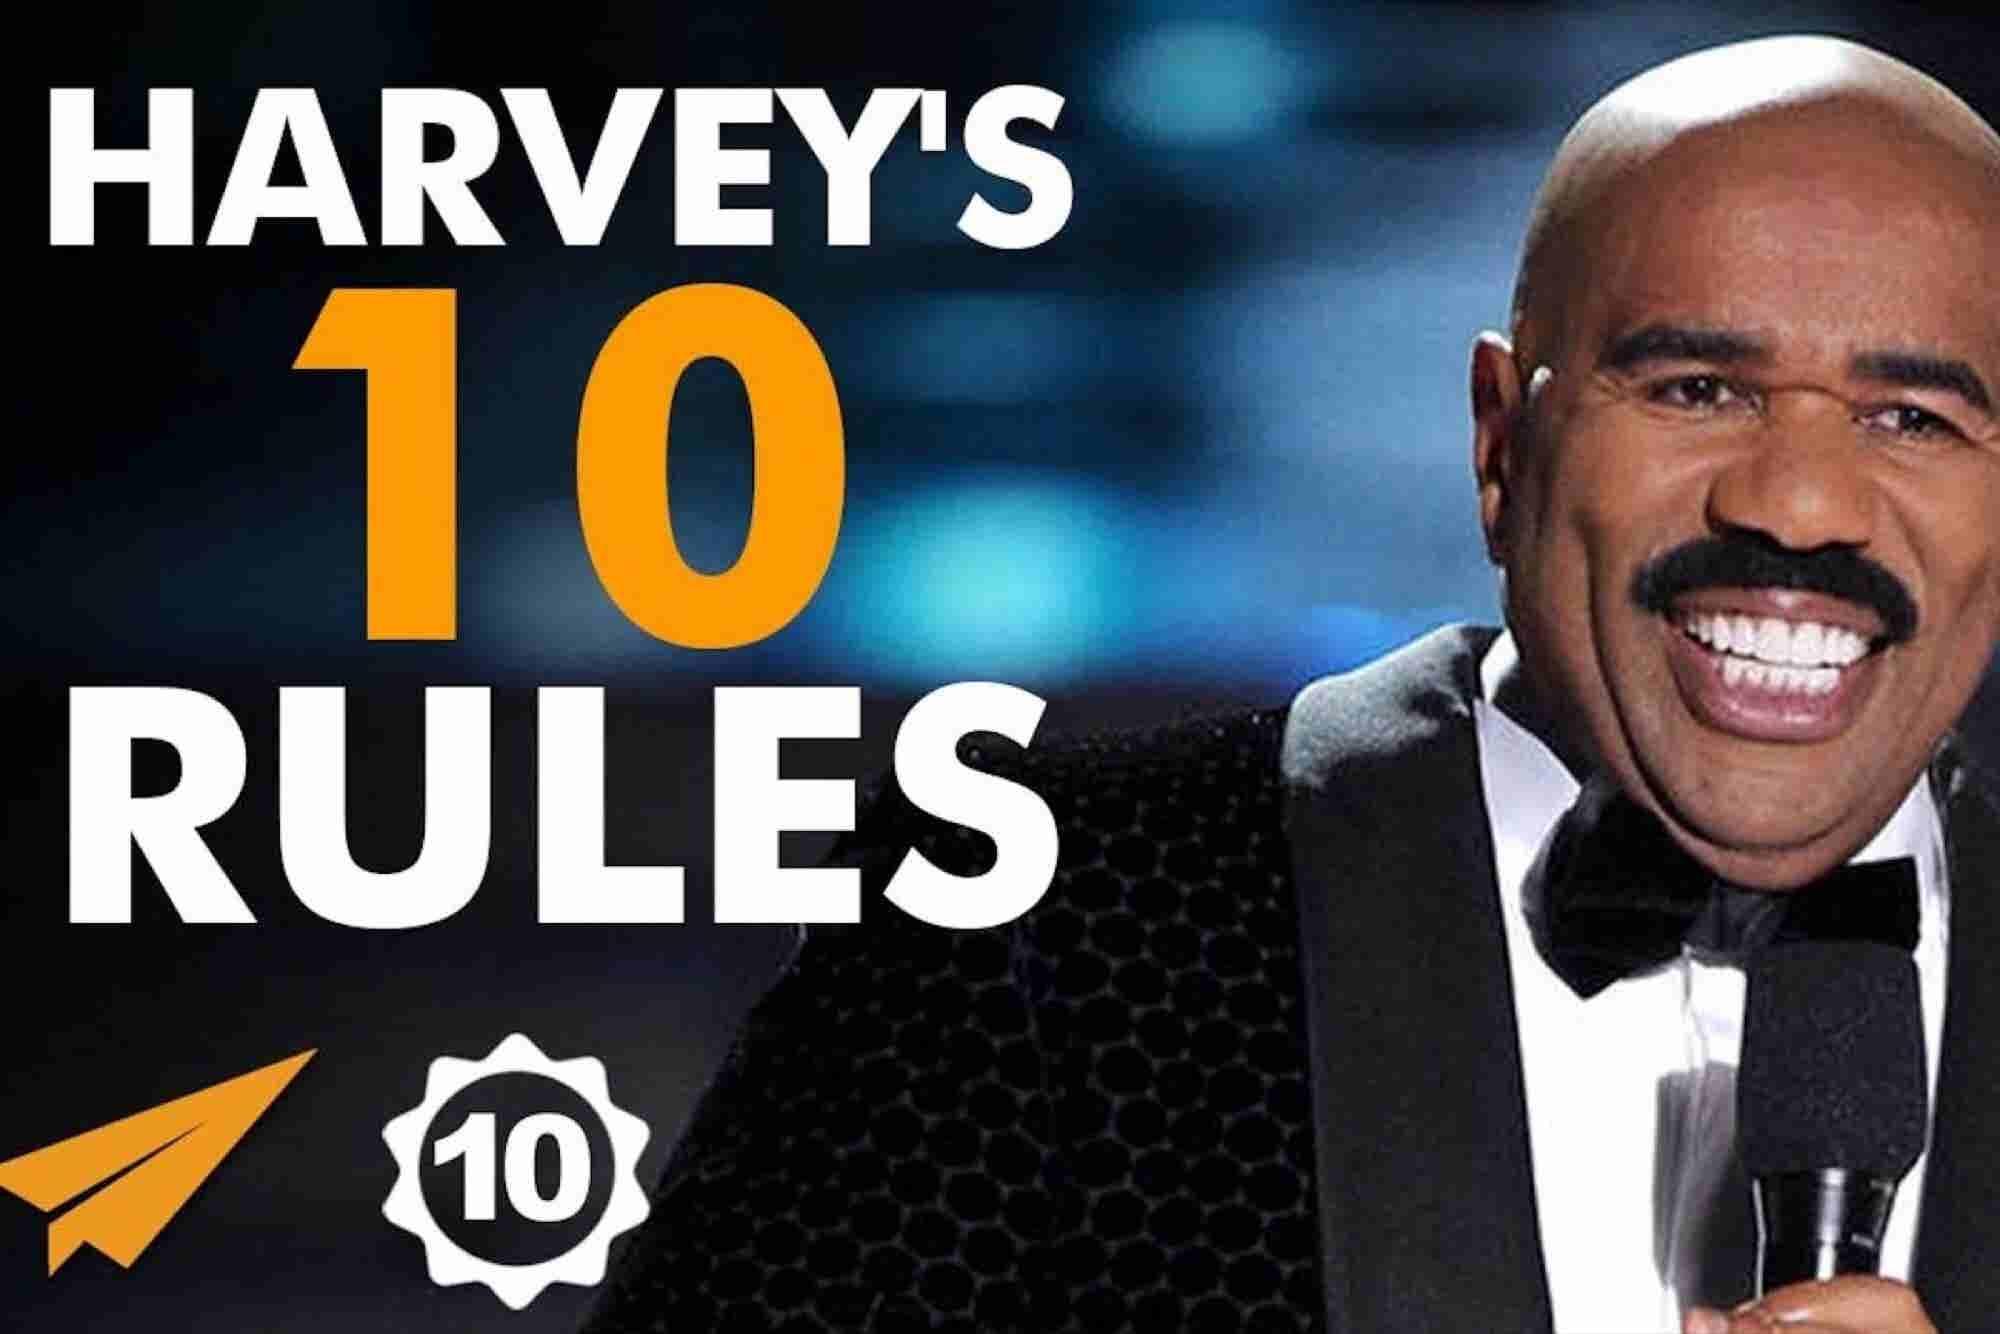 Steve Harvey's Top 10 Rules for Success